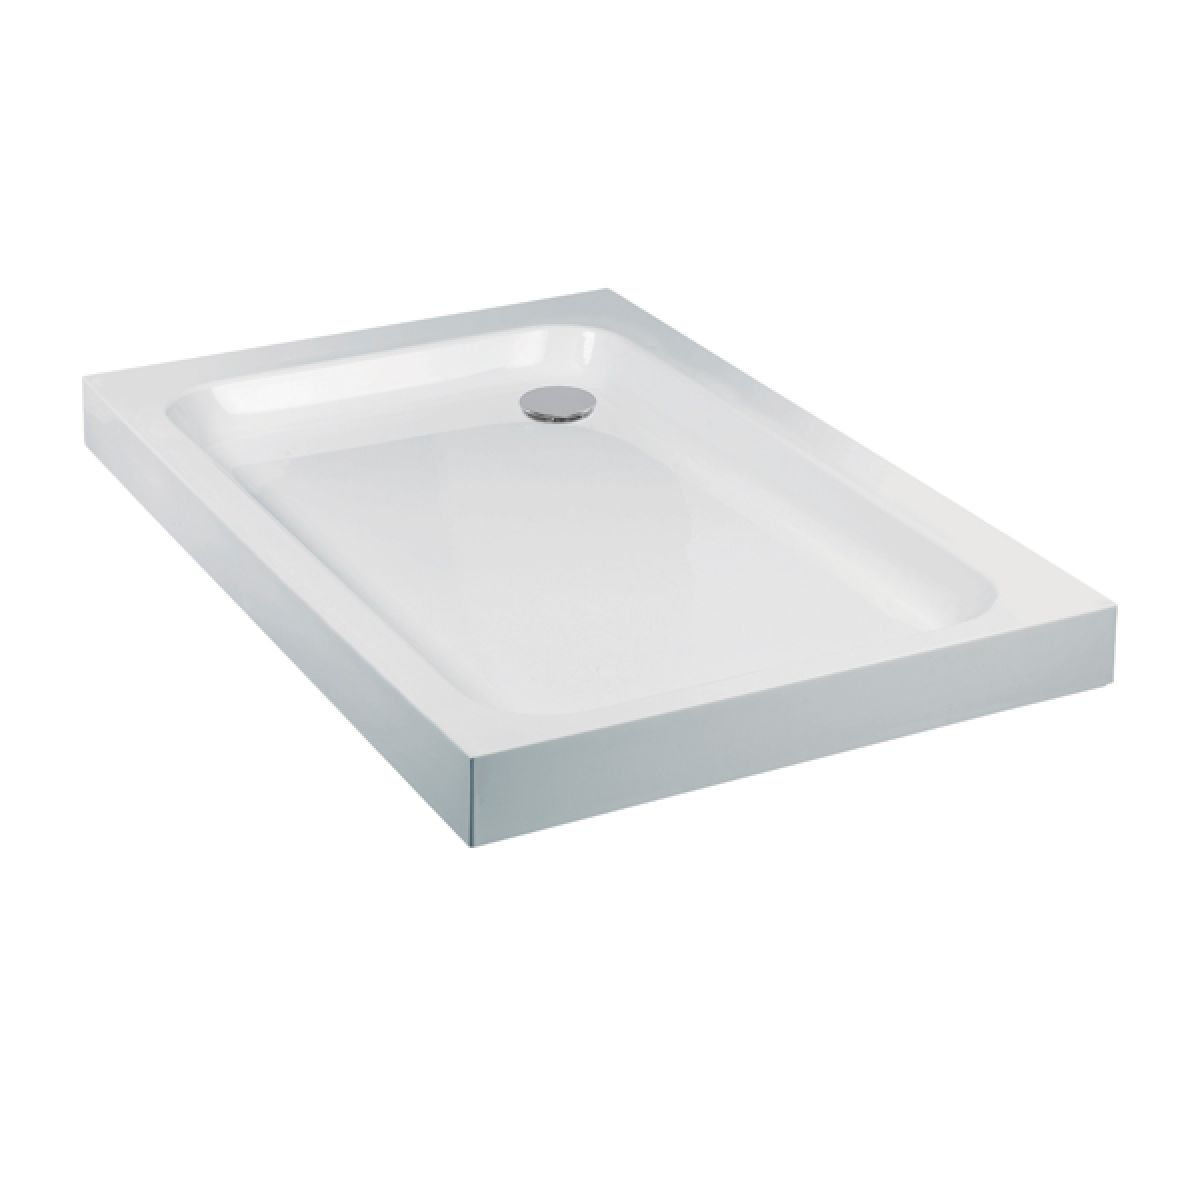 Frontline Standard Rectanglular Shower Tray 1000 x 800mm